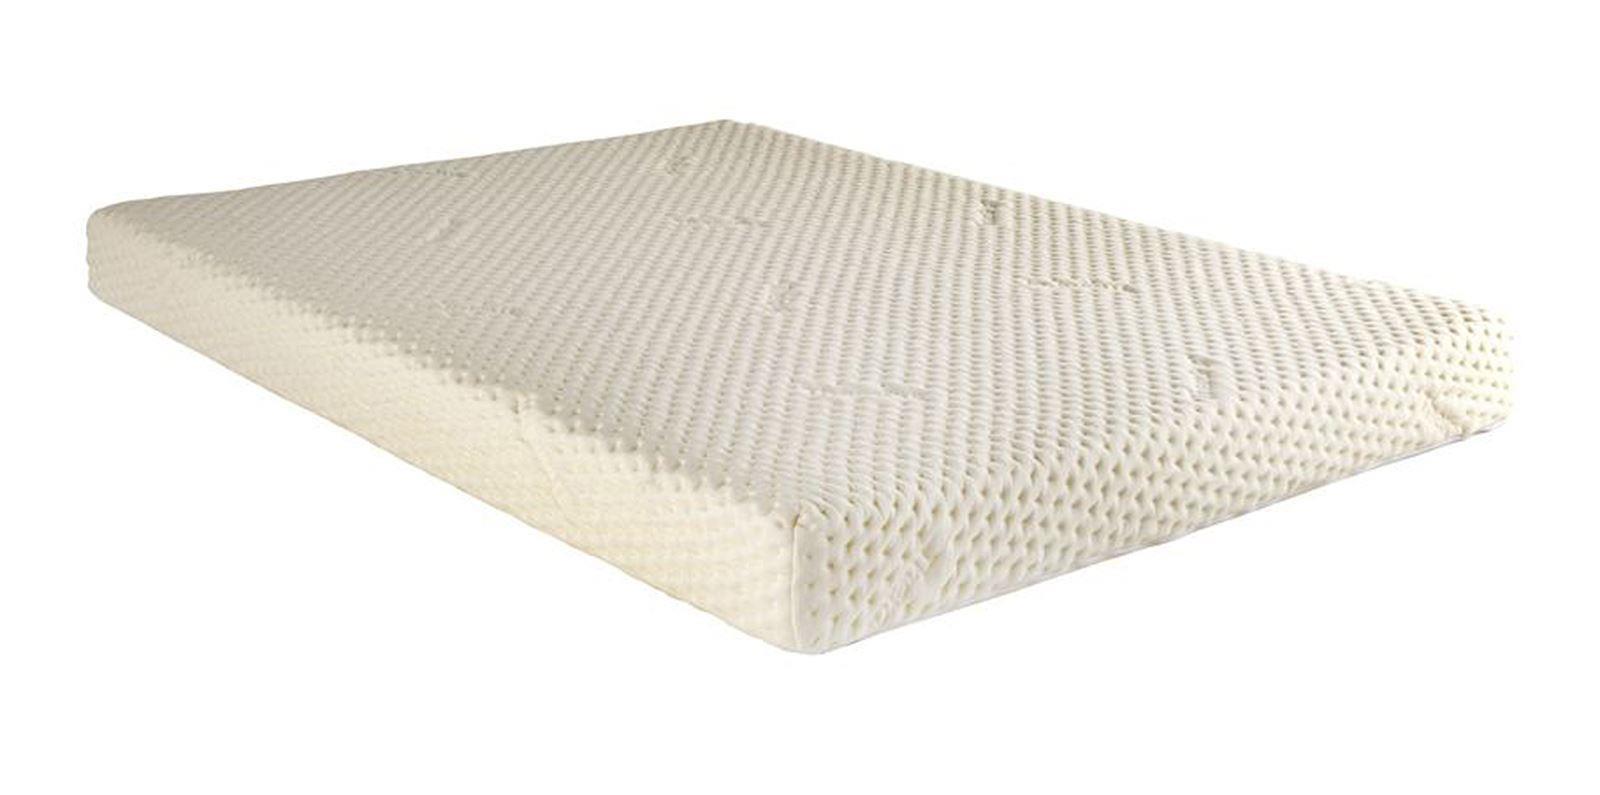 Front of Memory Foam Mattress 4ft6 Double [10 inch]